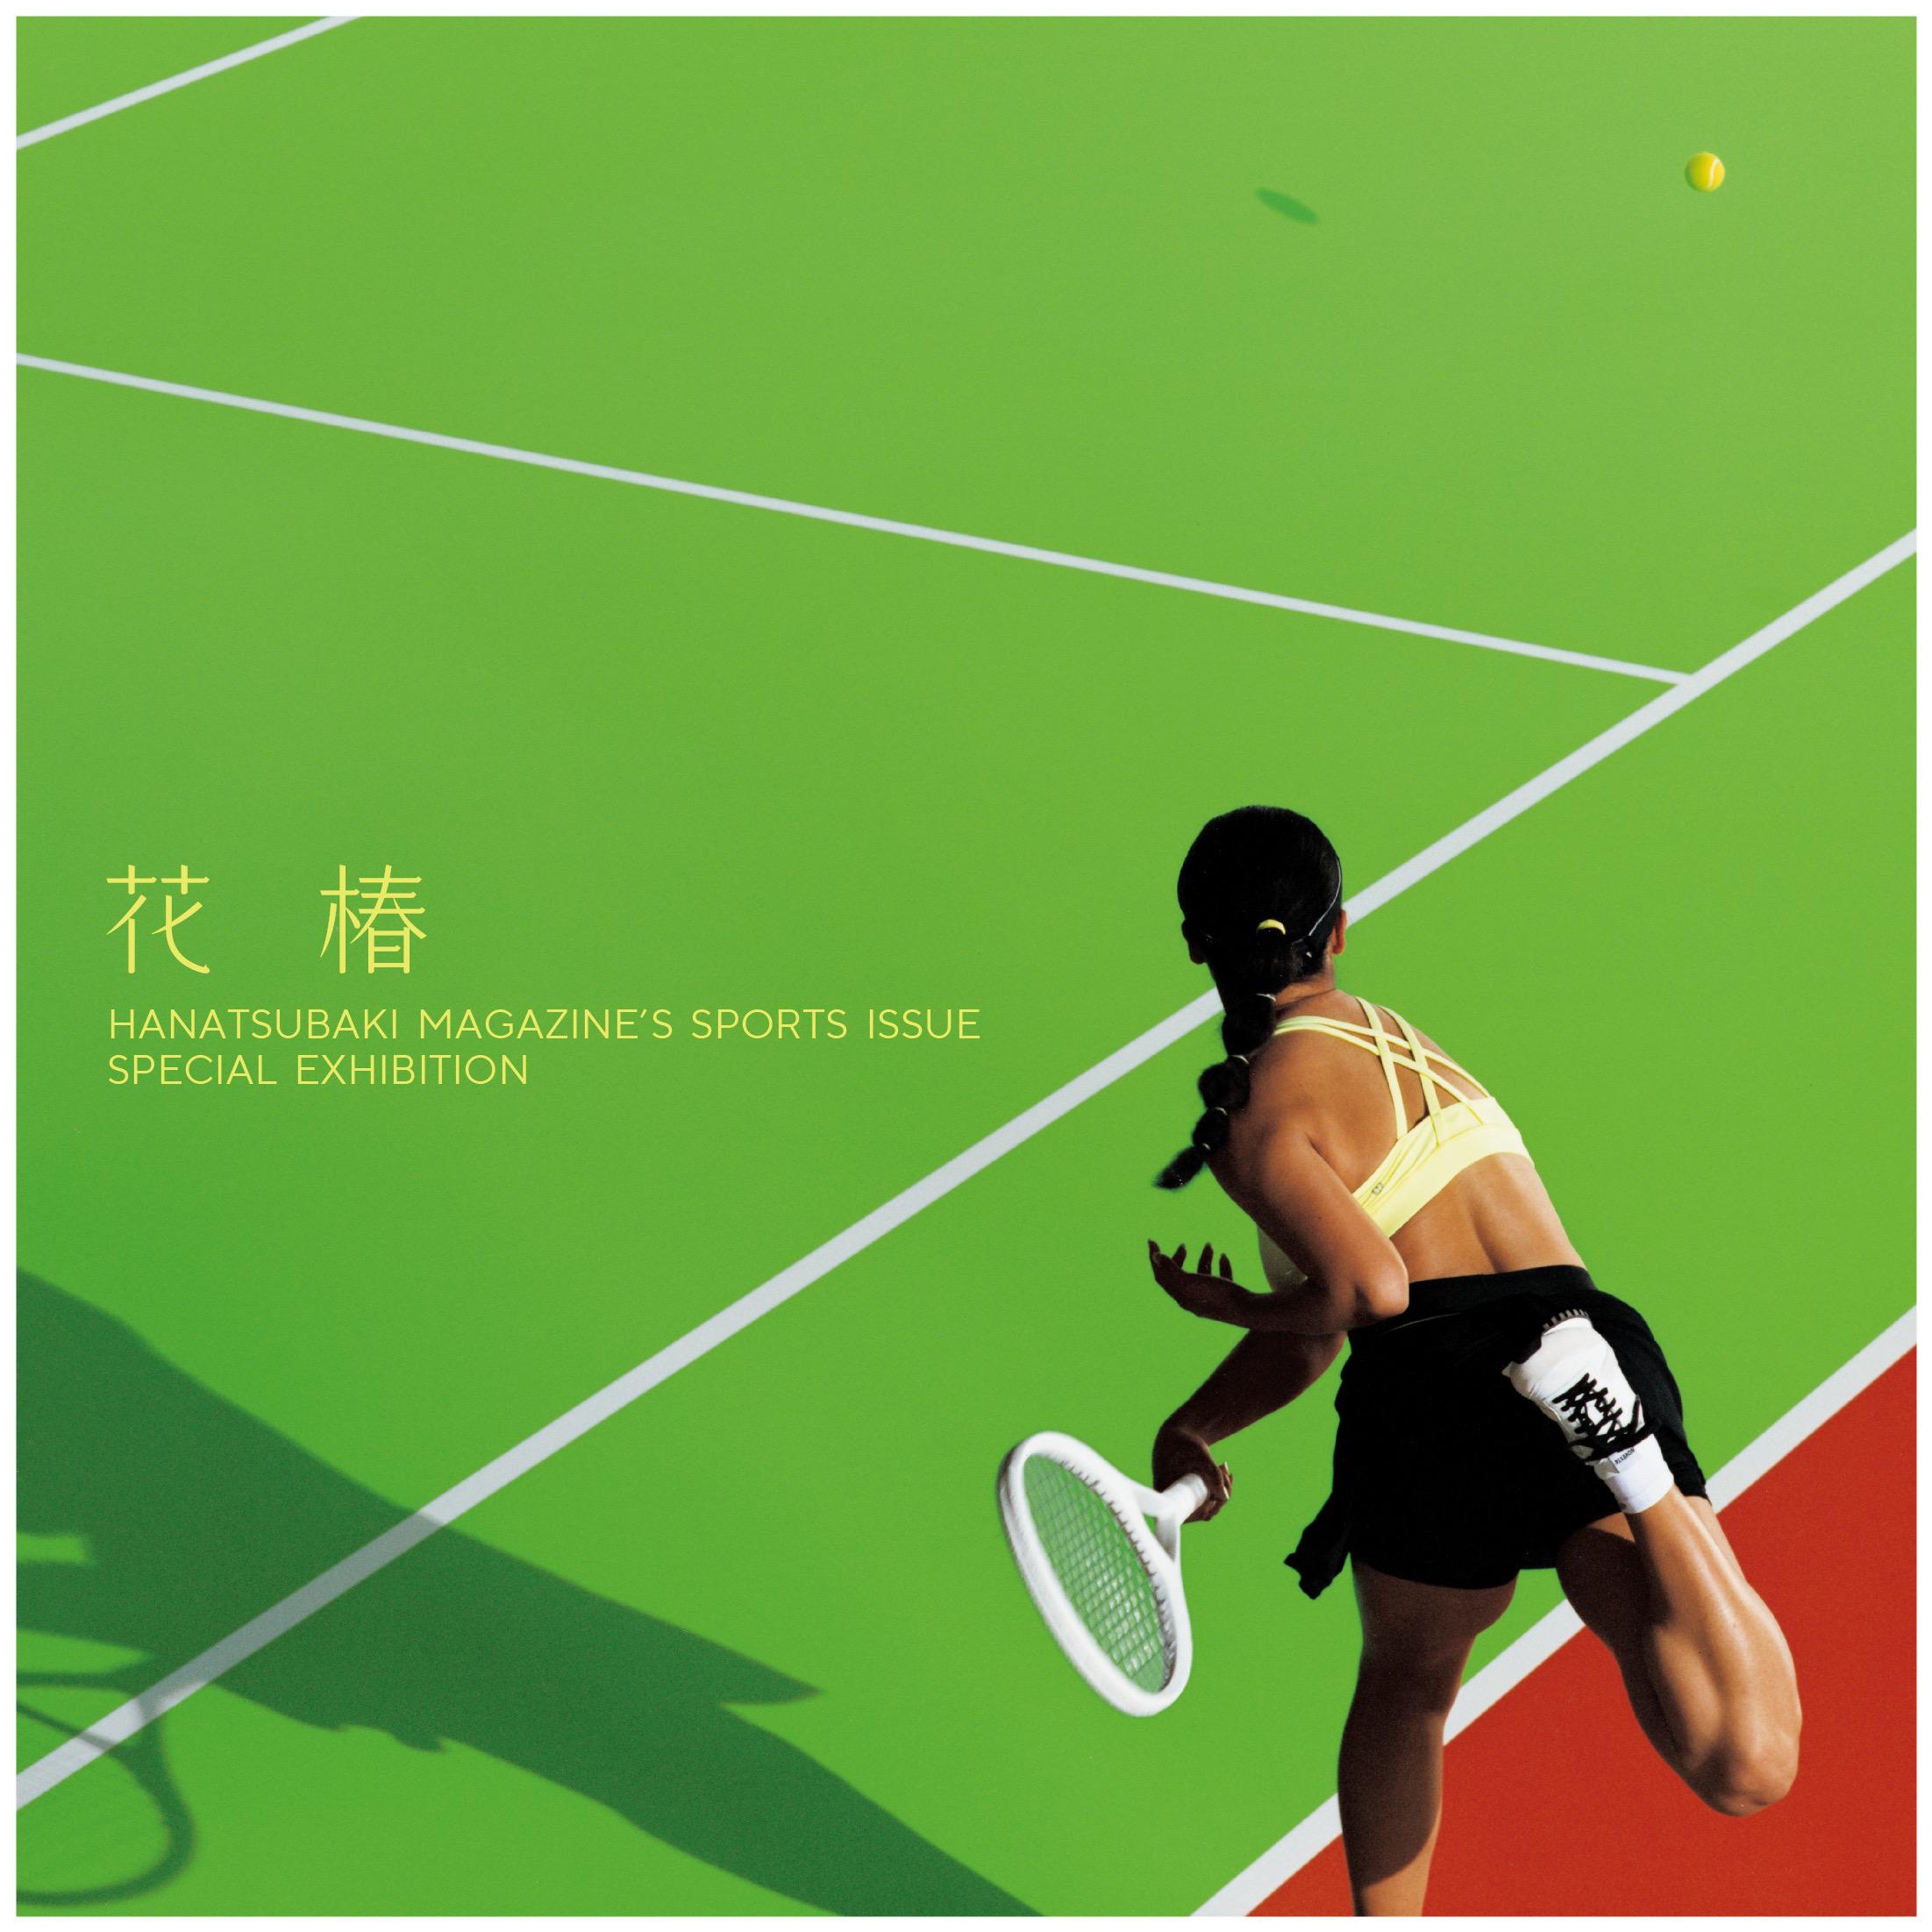 HANATSUBAKI MAGAZINE's SPECIAL EXHIBITION